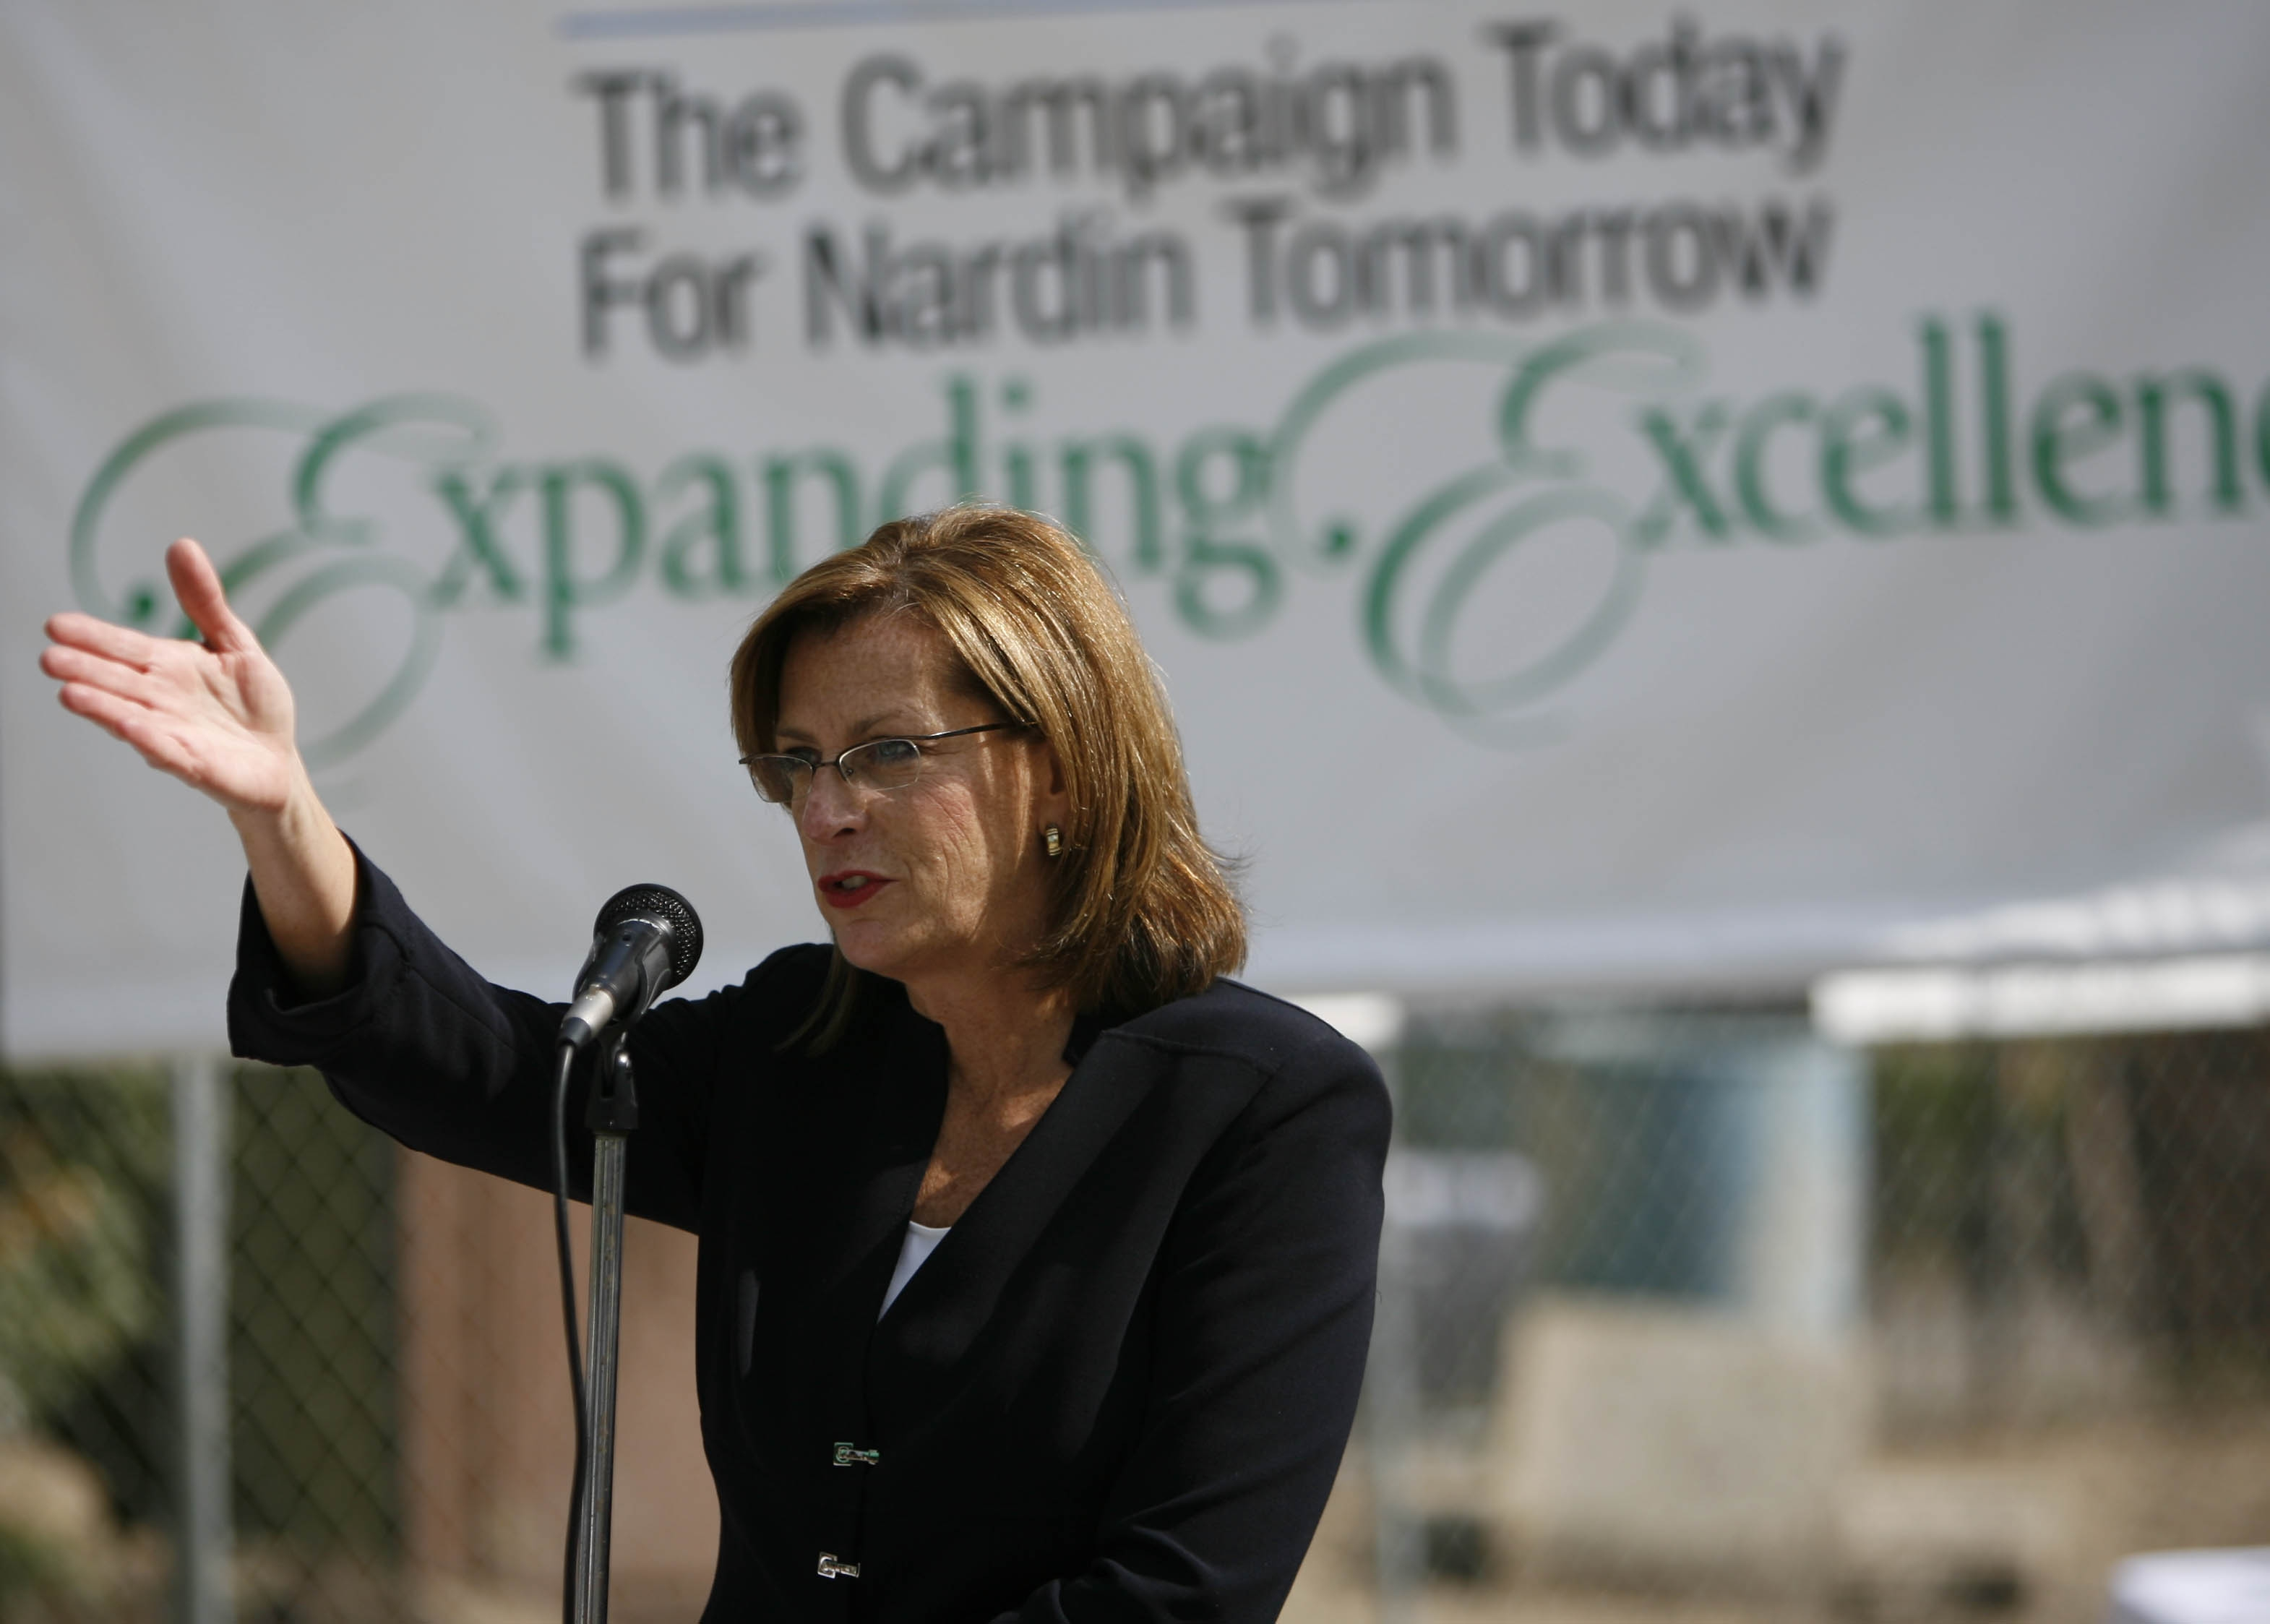 Nardin Academy President Marsha Joy Sullivan speaks during a ceremony at Nardin Academy on   Sept. 17, 2009. (Photo by Derek Gee)